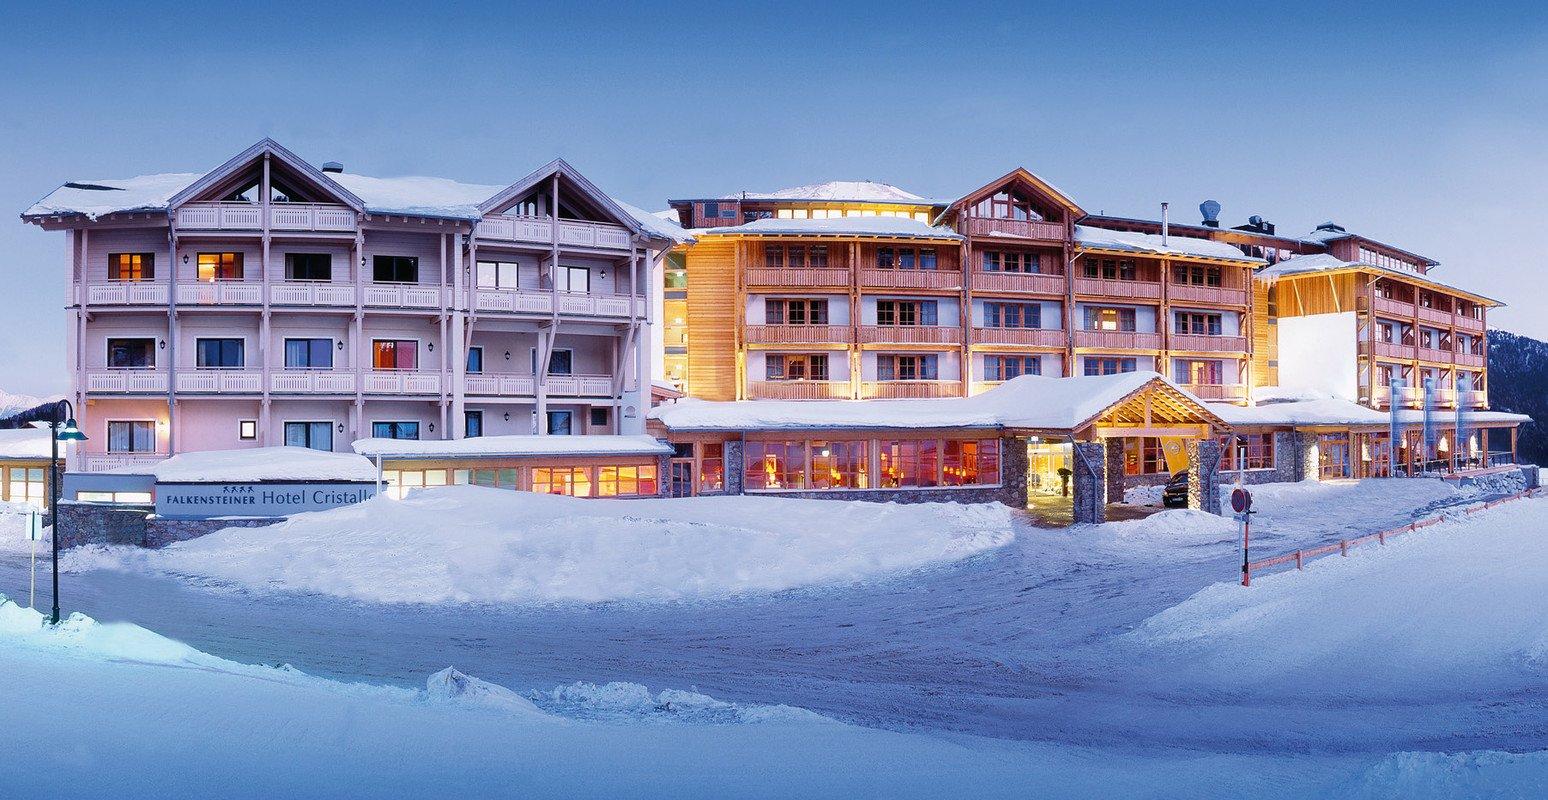 Austrija, Katschberg, Falkensteiner Hotel Cristallo